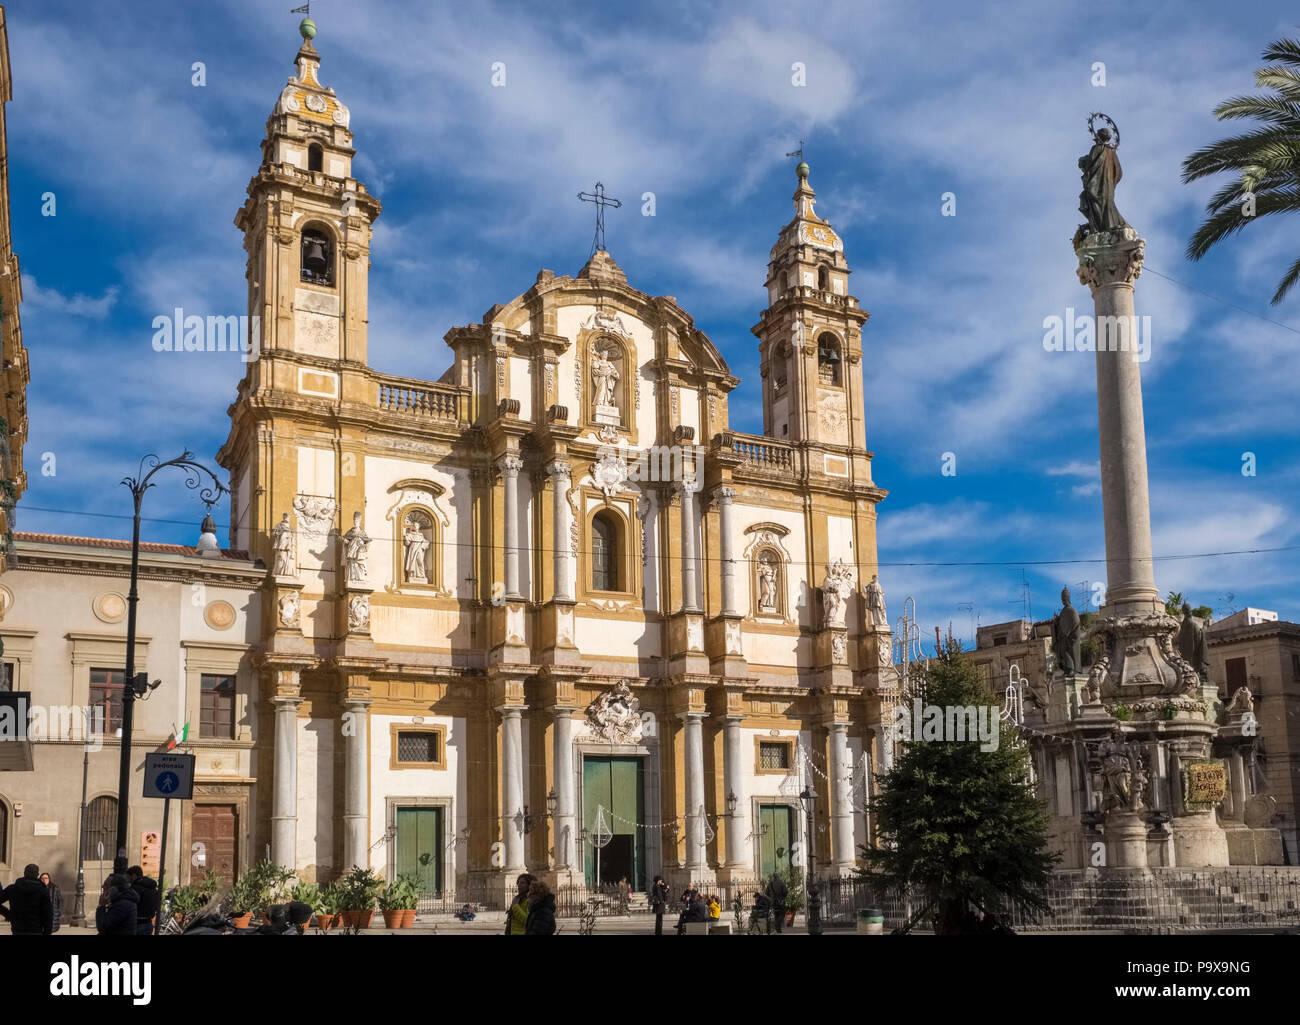 Sicily San Domenico church, Palermo, Sicily, Italy, Europe - Stock Image